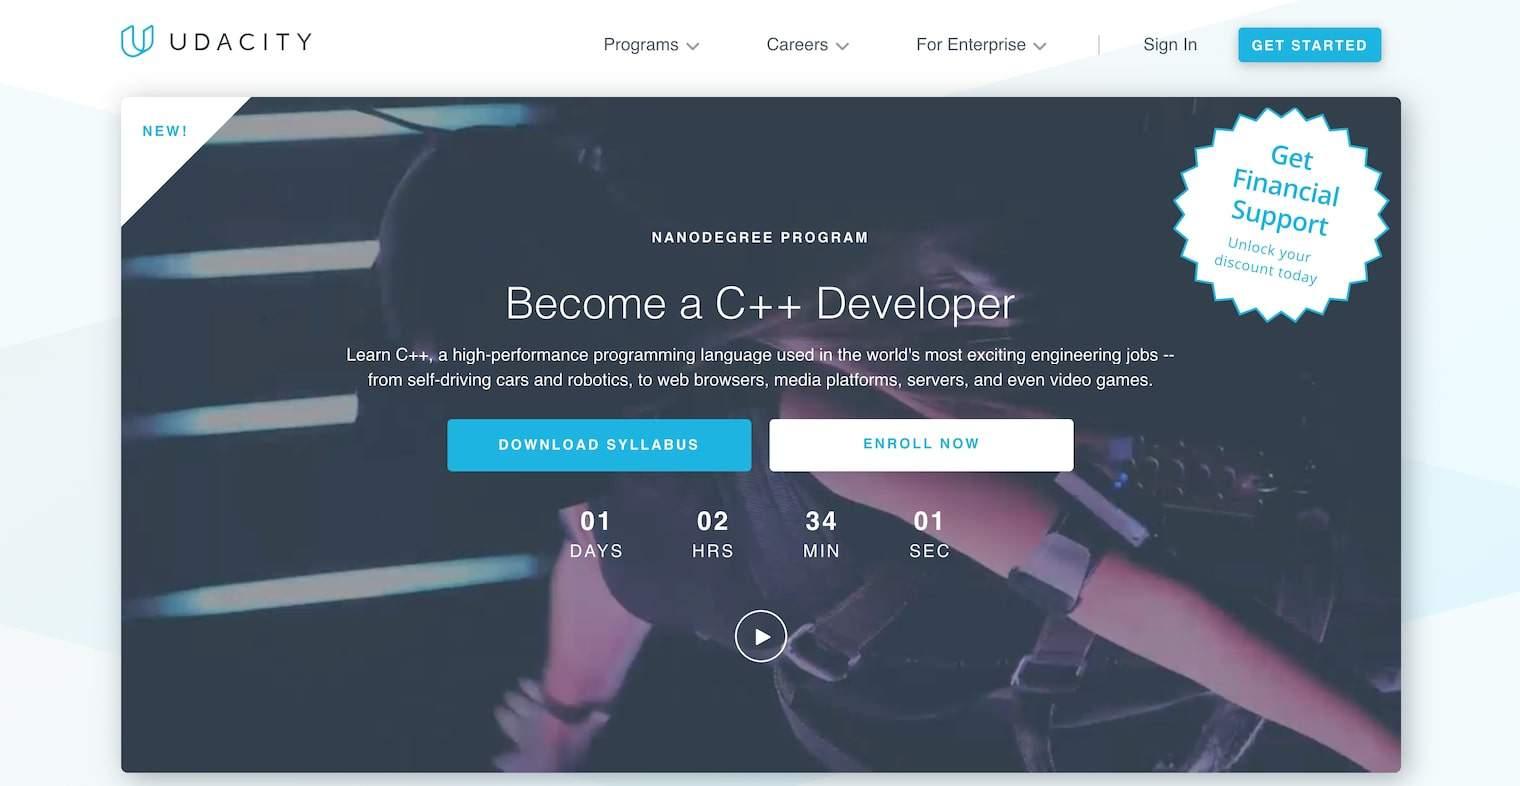 Become a C++ Developer (Udacity)